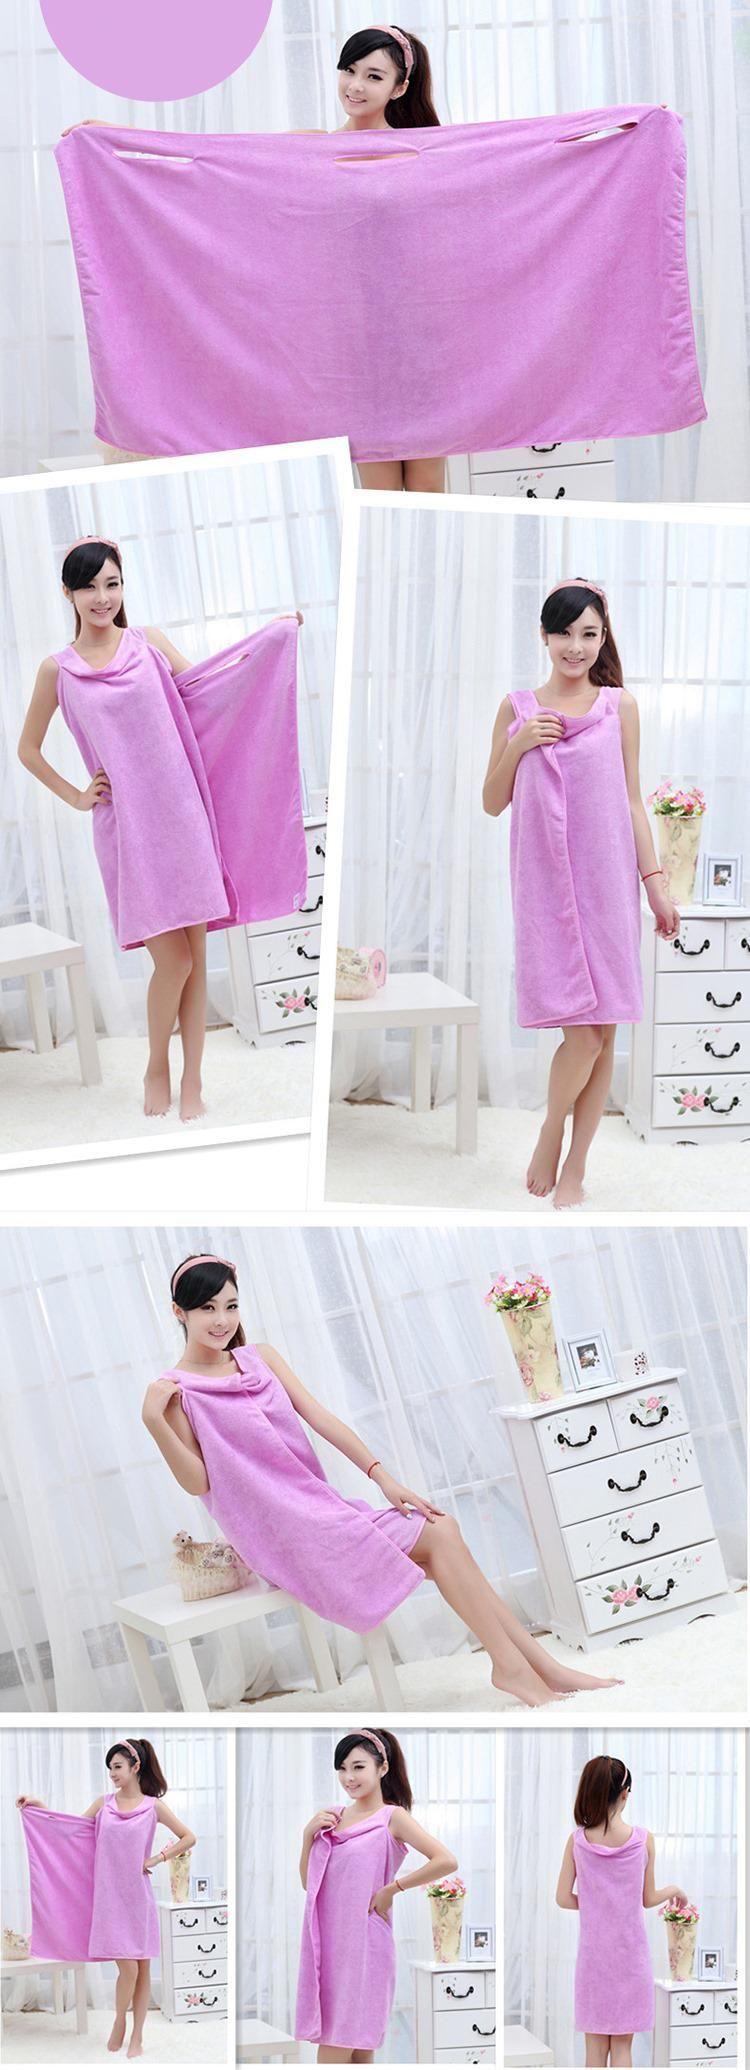 Magic Bath Towels Lady Girls Wearable Fast Drying Magic Bath Towel Robes Skirt SPA Shower Towel Body Wrap Bath Robe Bathrobe